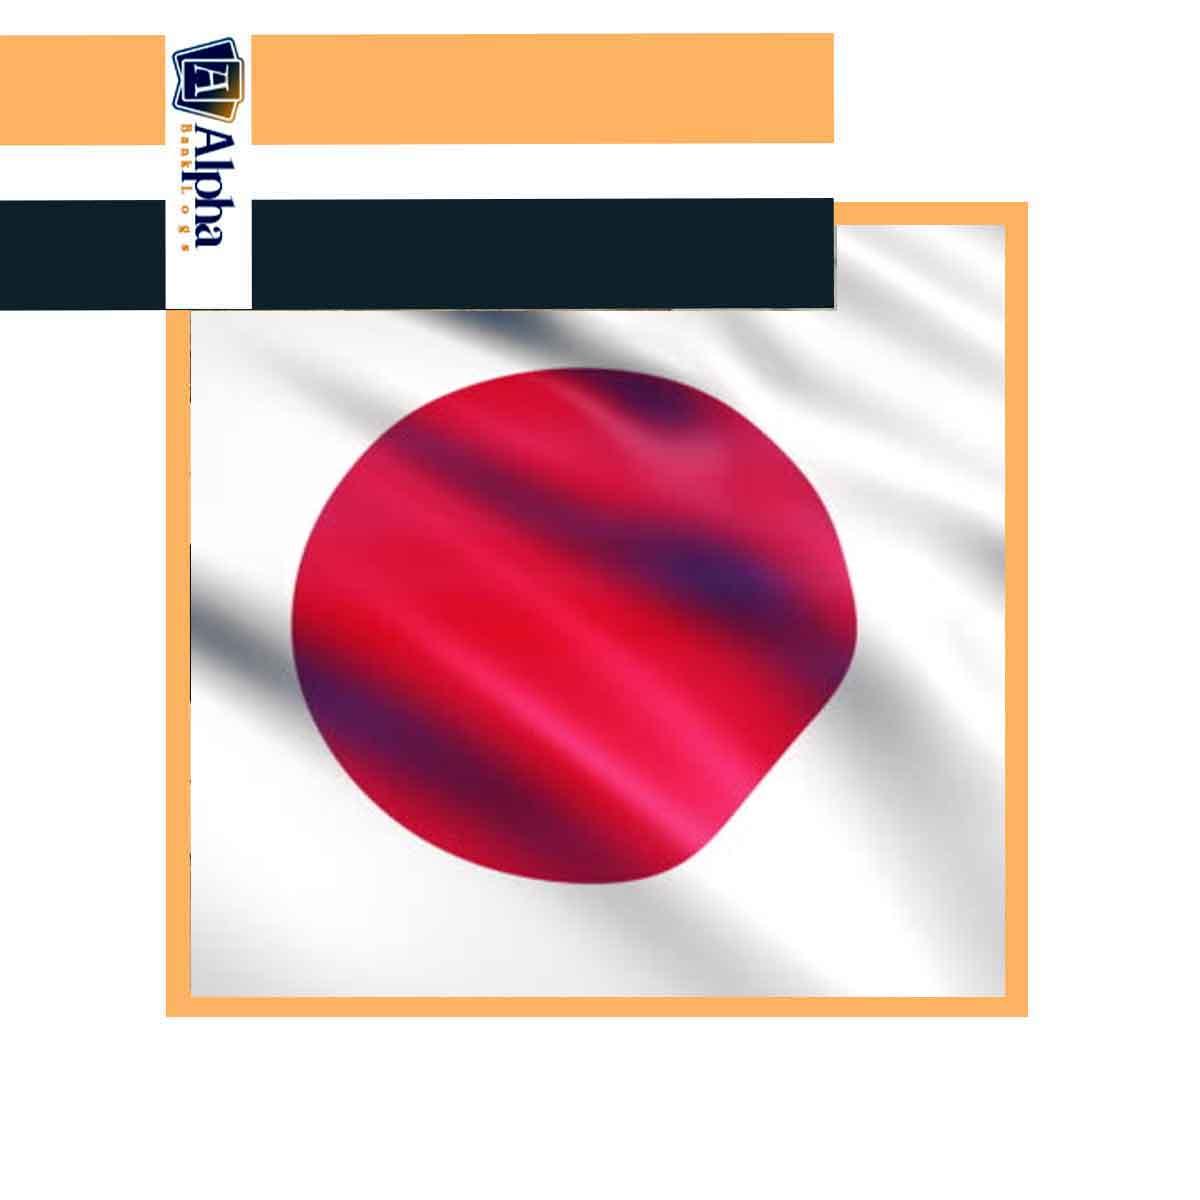 Japan CC Fullz(CVV) x 5 item pack JCB Only